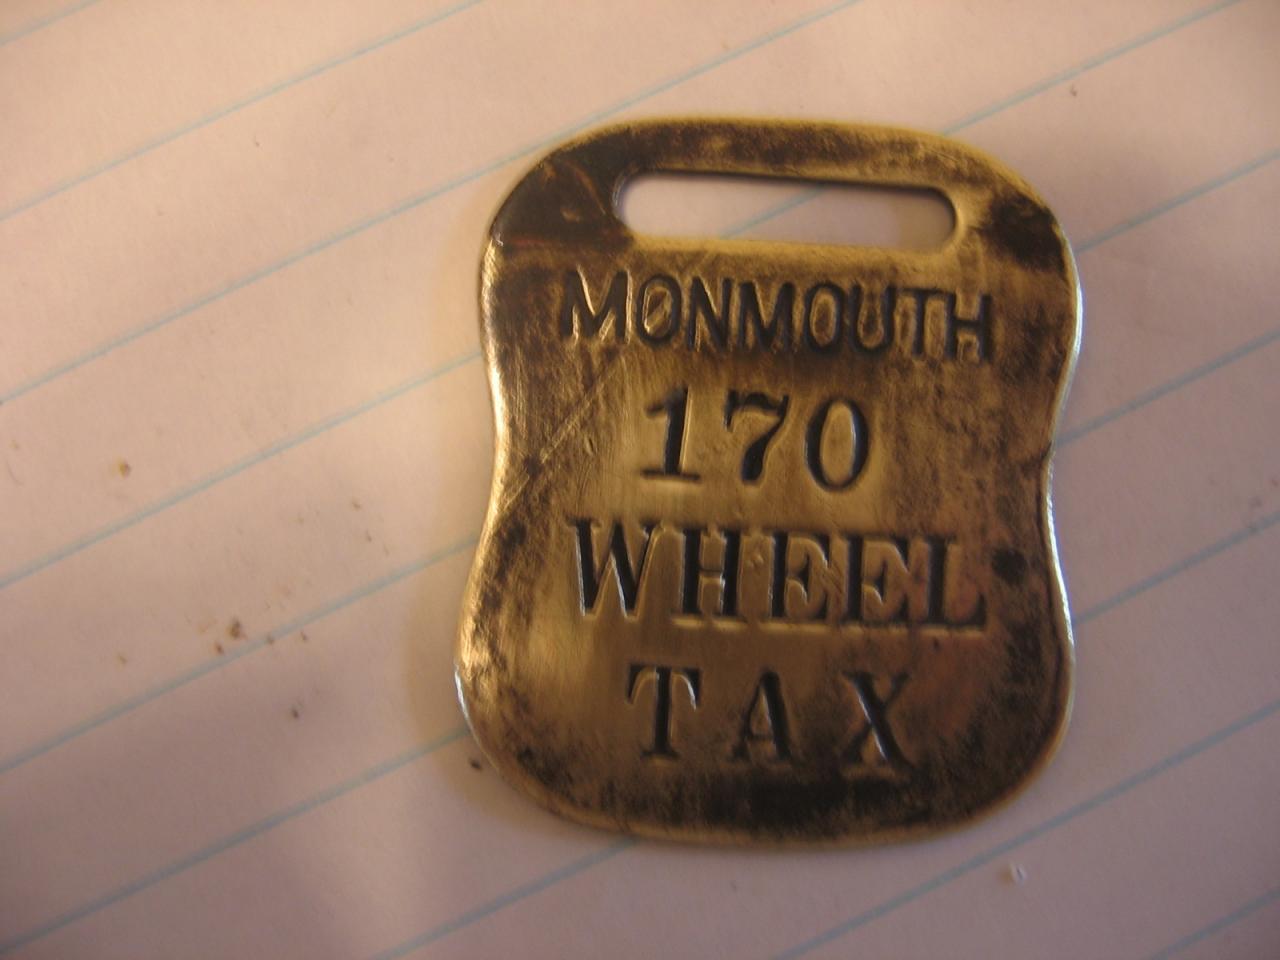 monmouth wheel tax.jpg